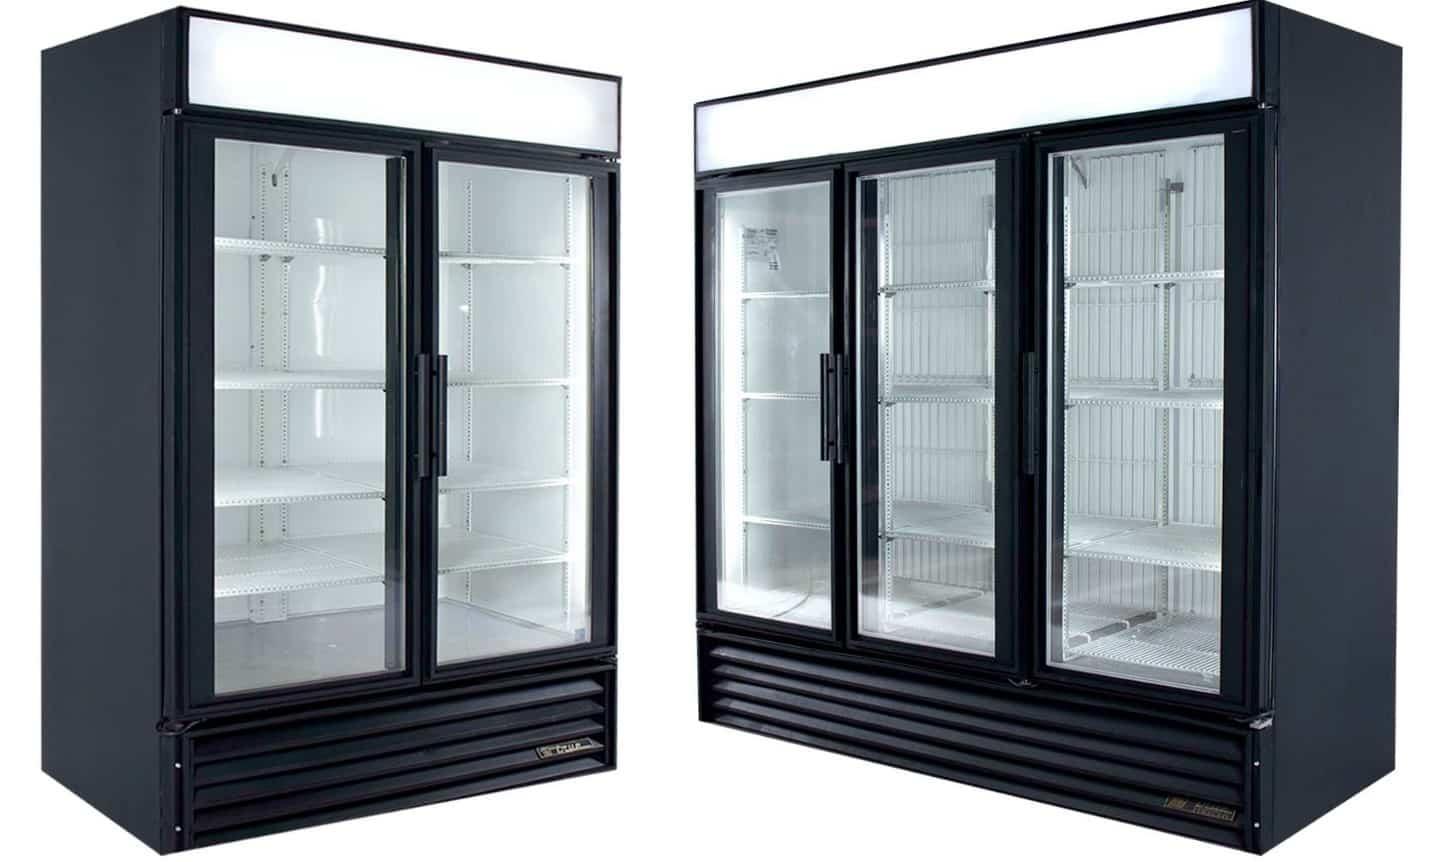 Refrigirator